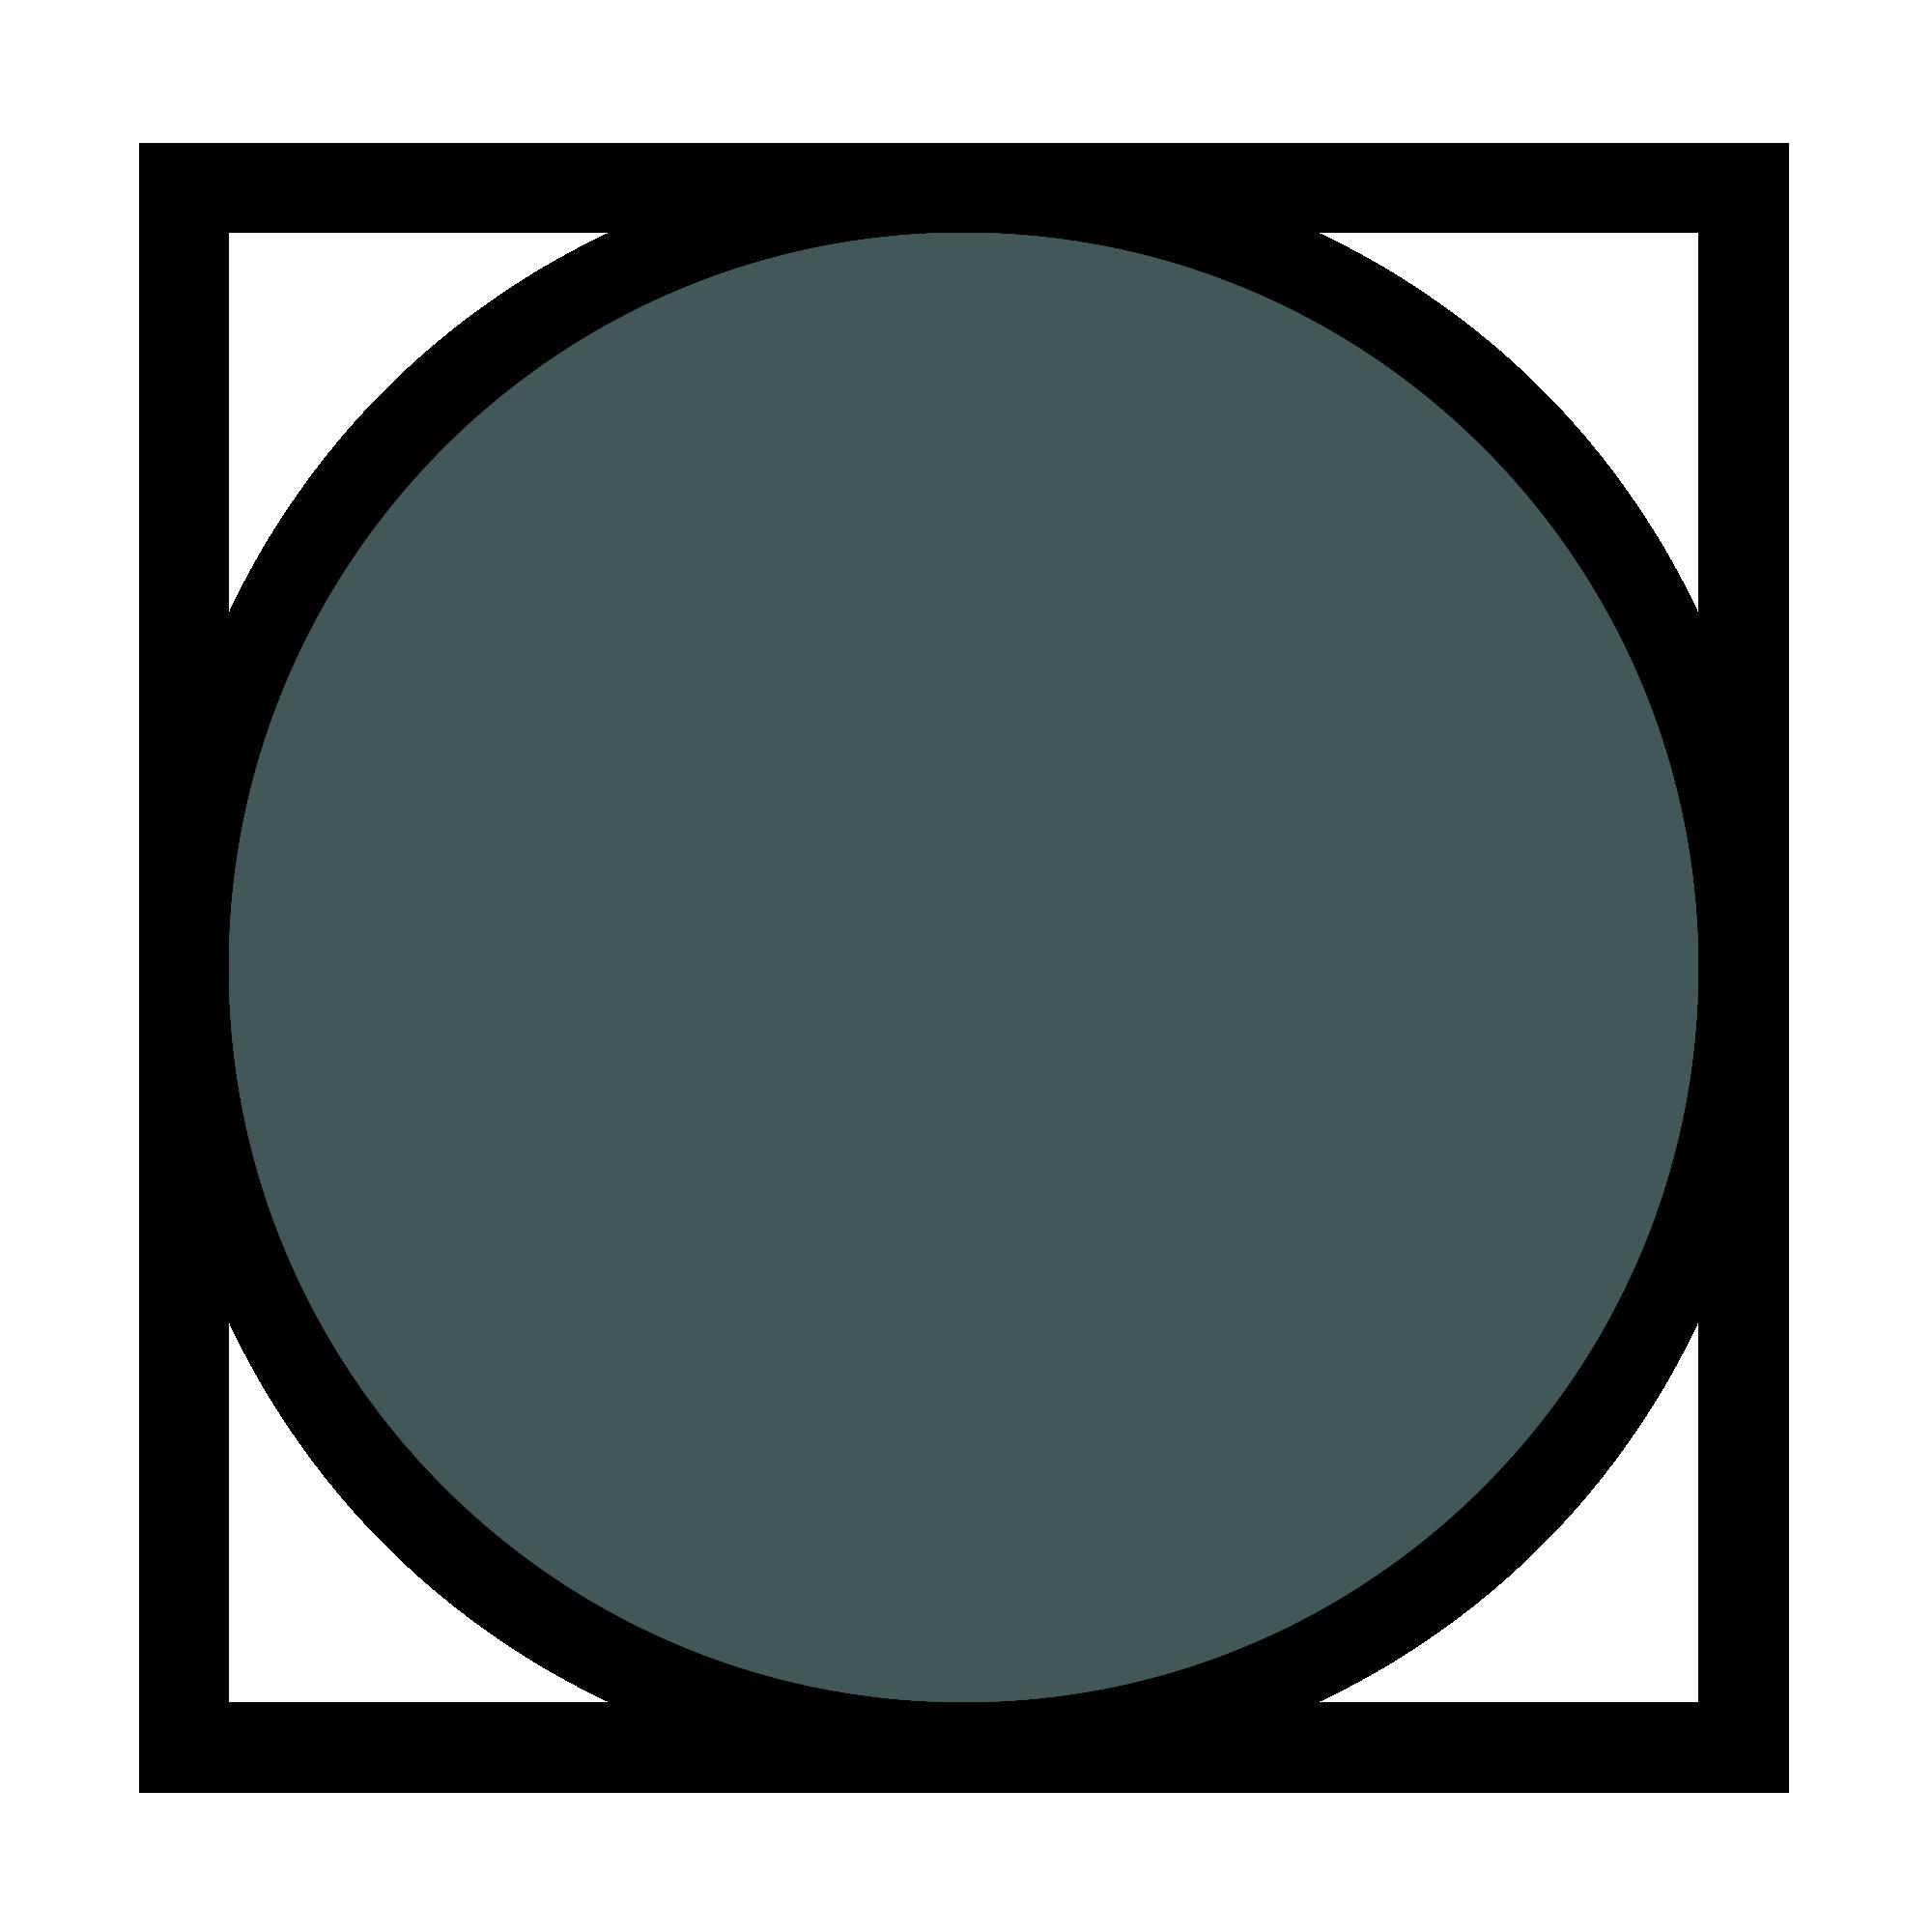 Schau und Horch Logo Genua grau - Corporate Identity für Genua